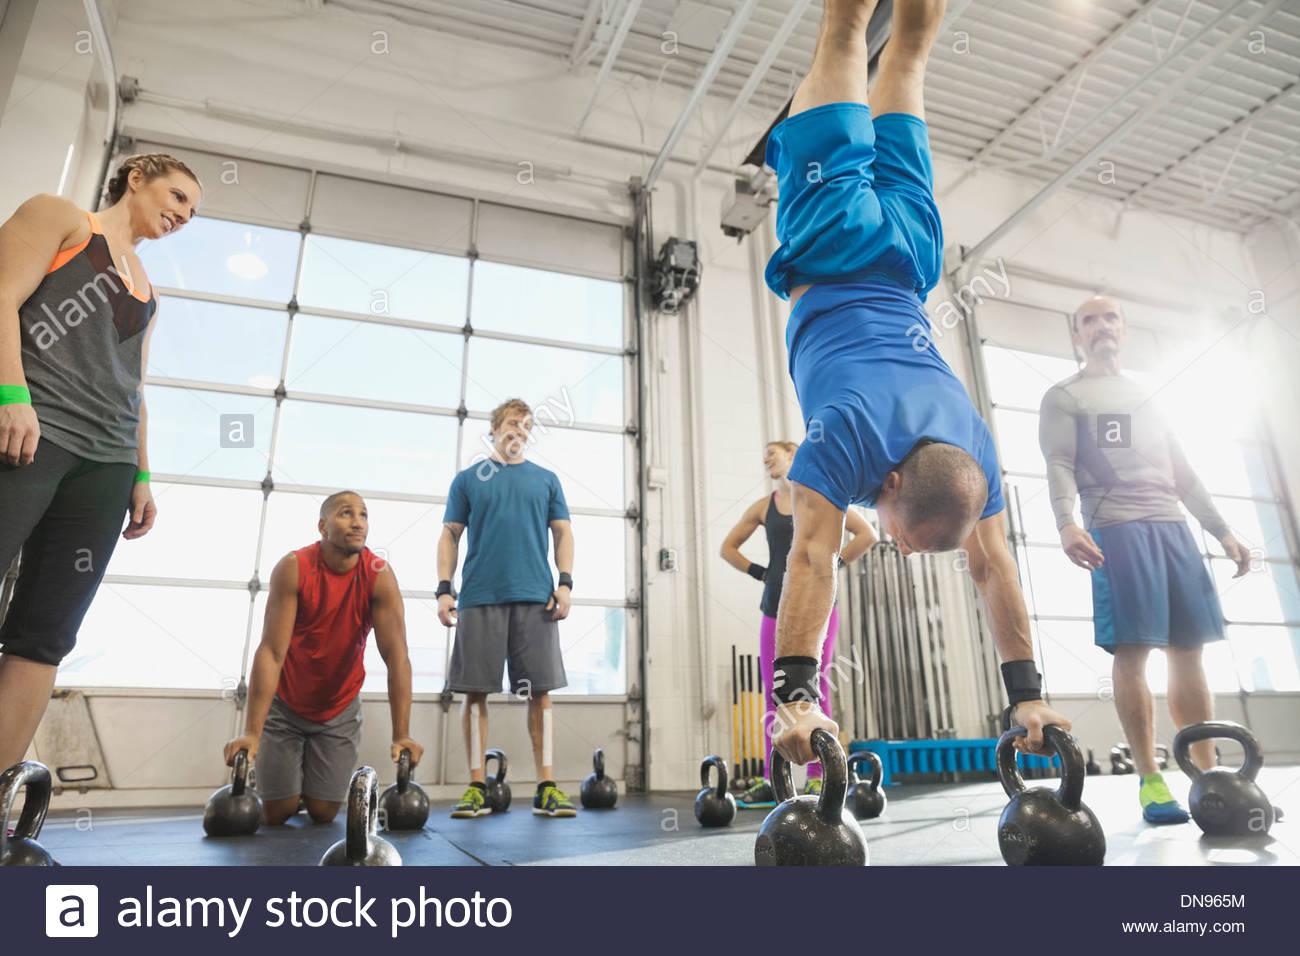 Man practicing kettlebell handstand - Stock Image